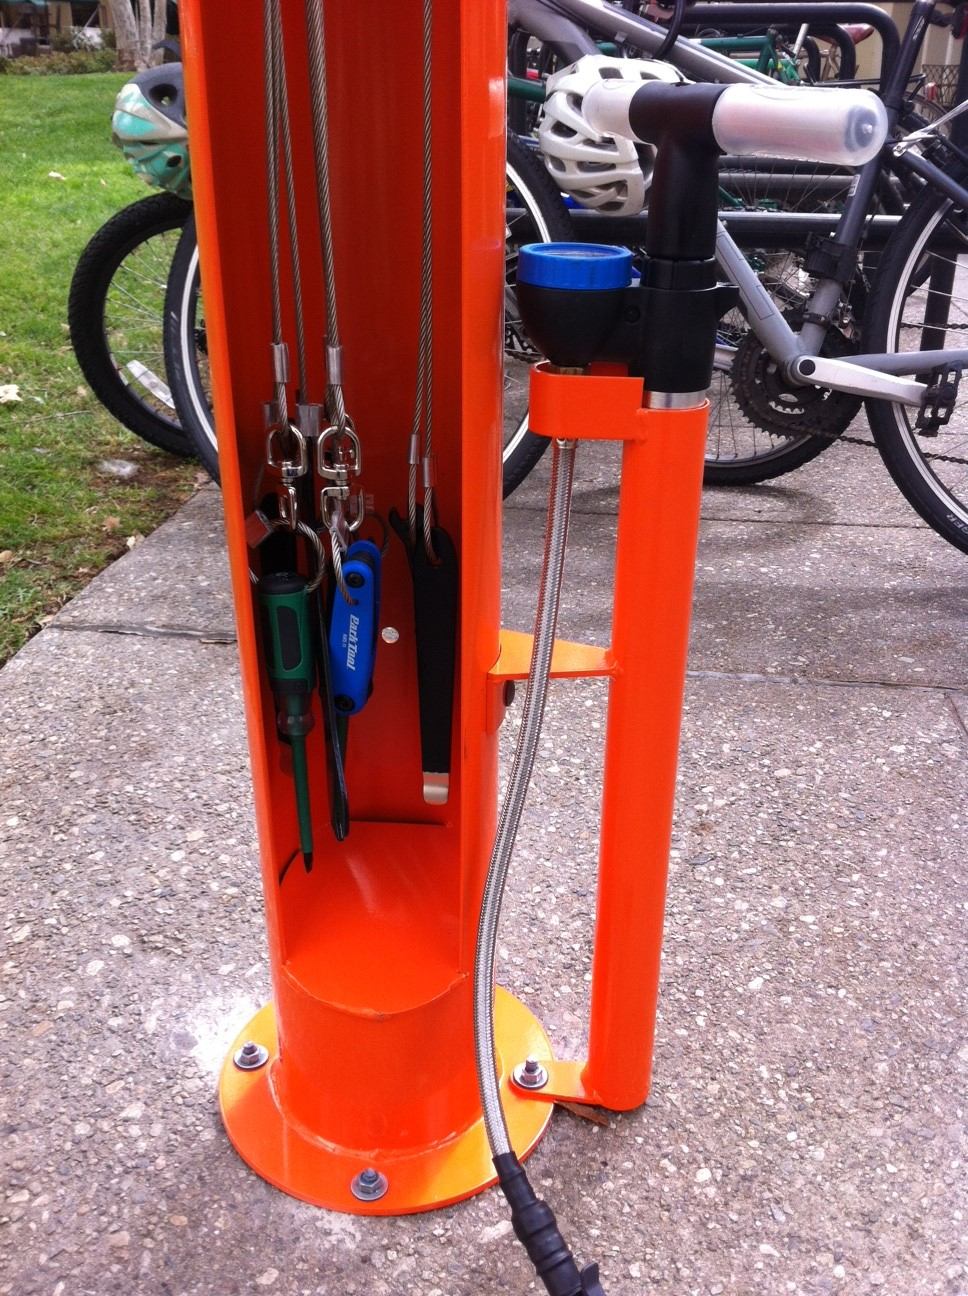 Caltech Bike Lab Check Out The New Dero Fixit Diy Bike